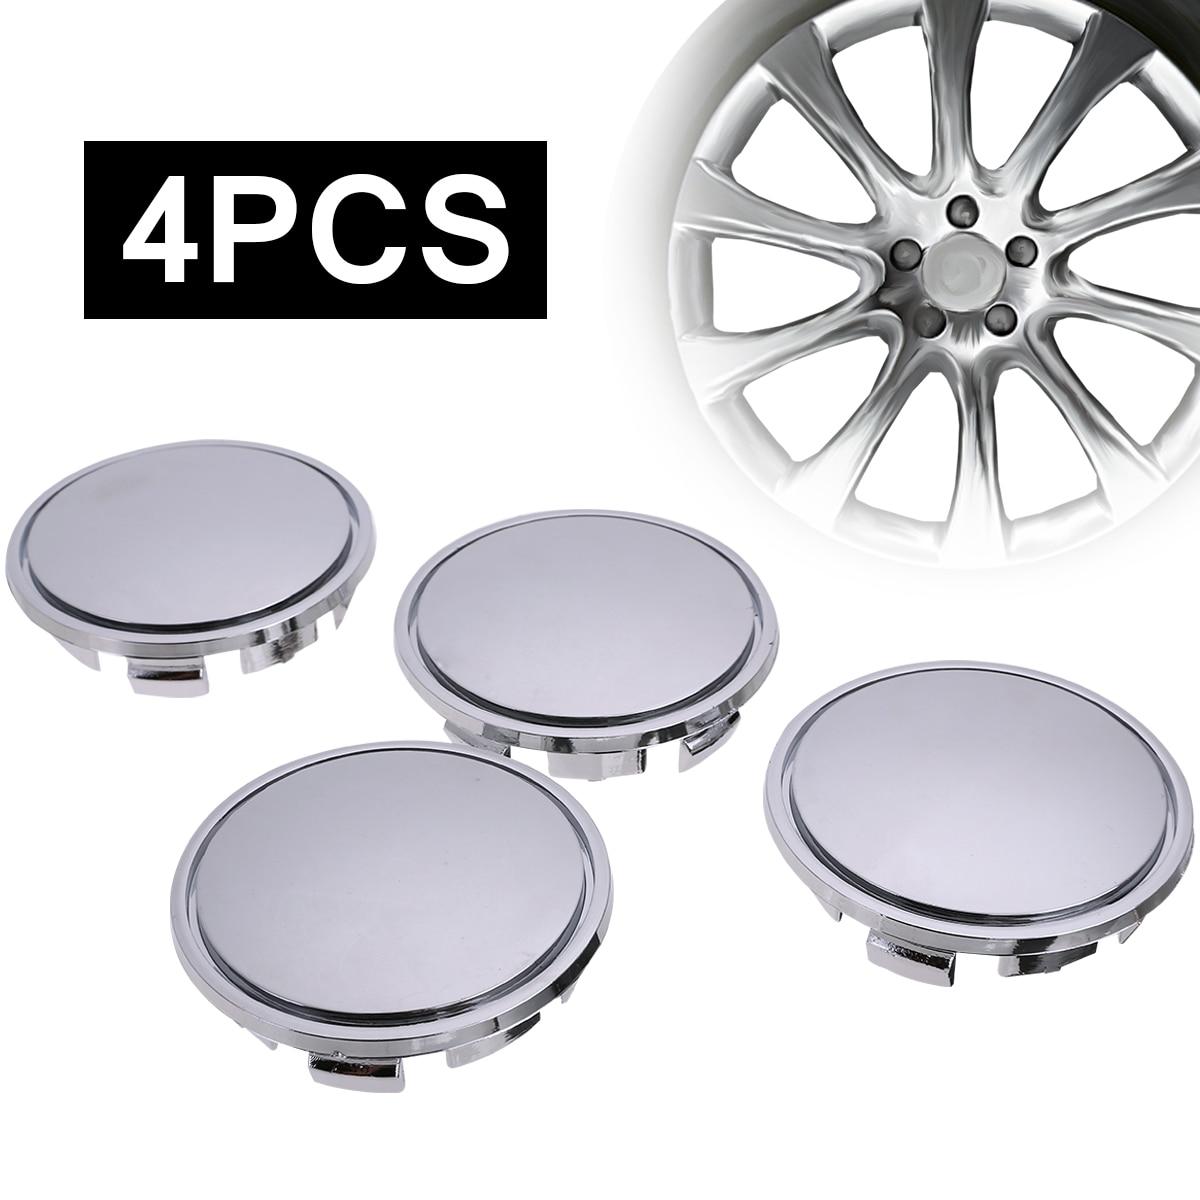 4x Wheel Center Cover Wheel Hub Cap Auto Tyre Rim Cover Universal 65mm Hub Caps